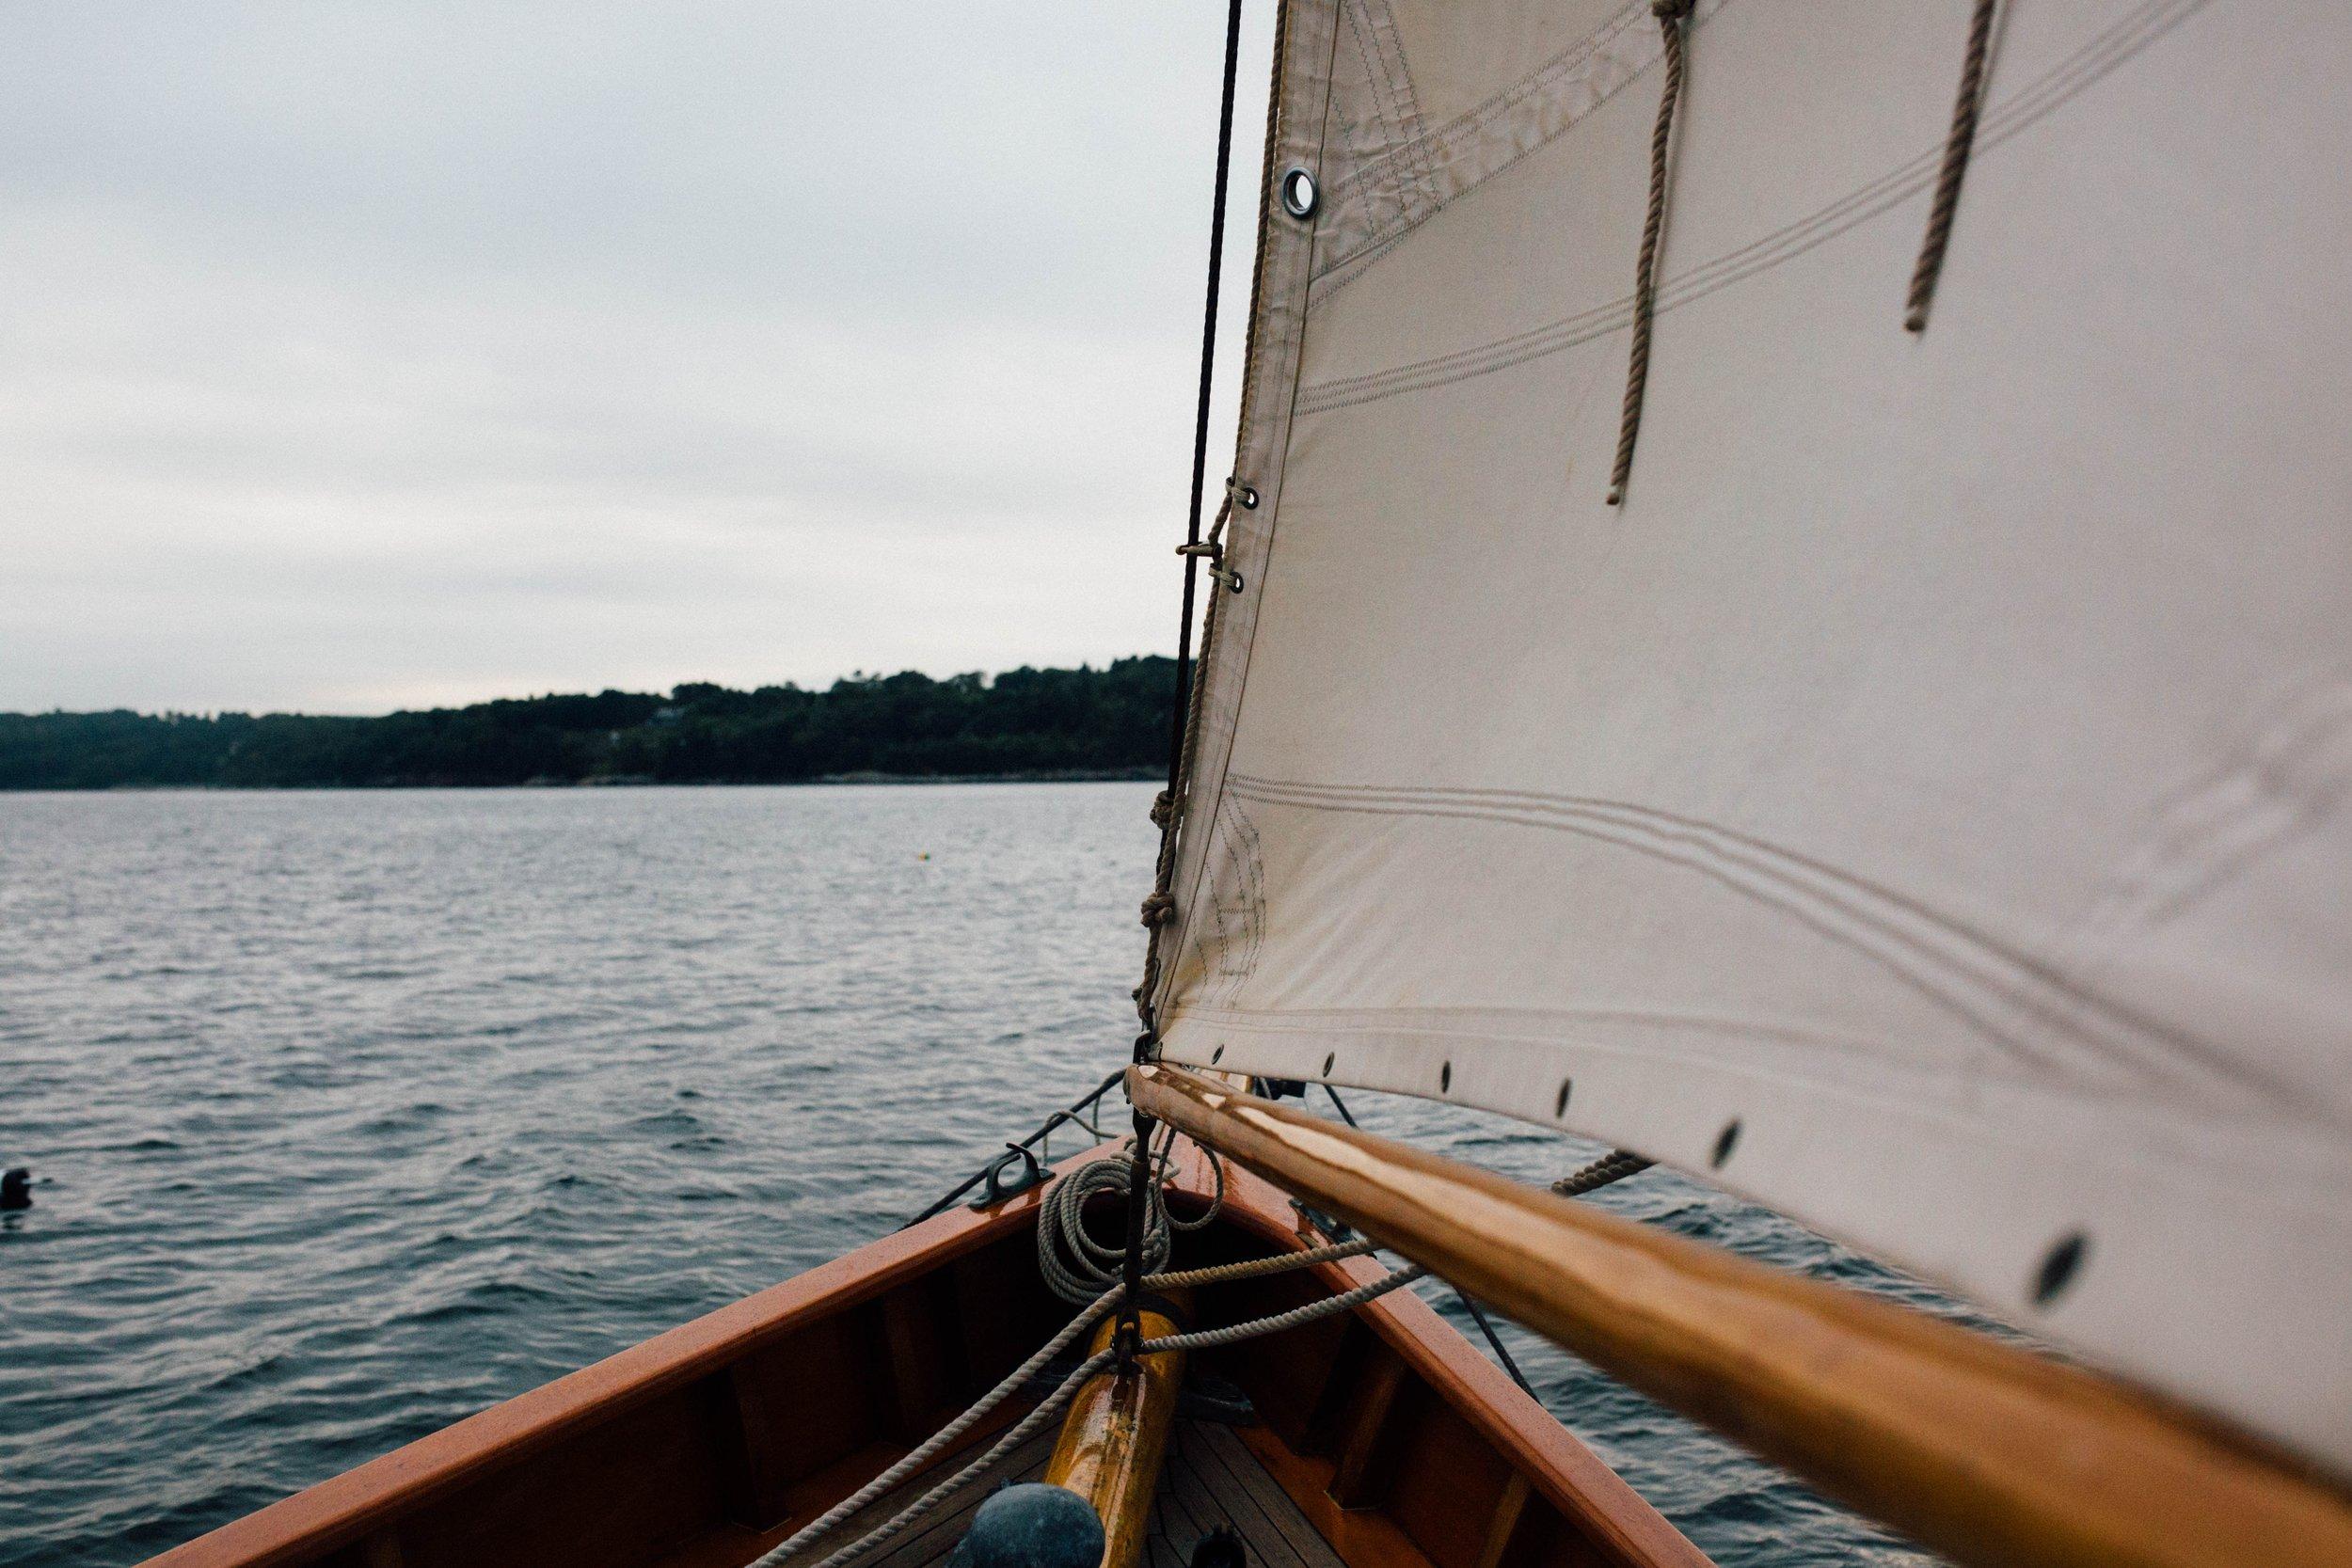 Boatyard projects